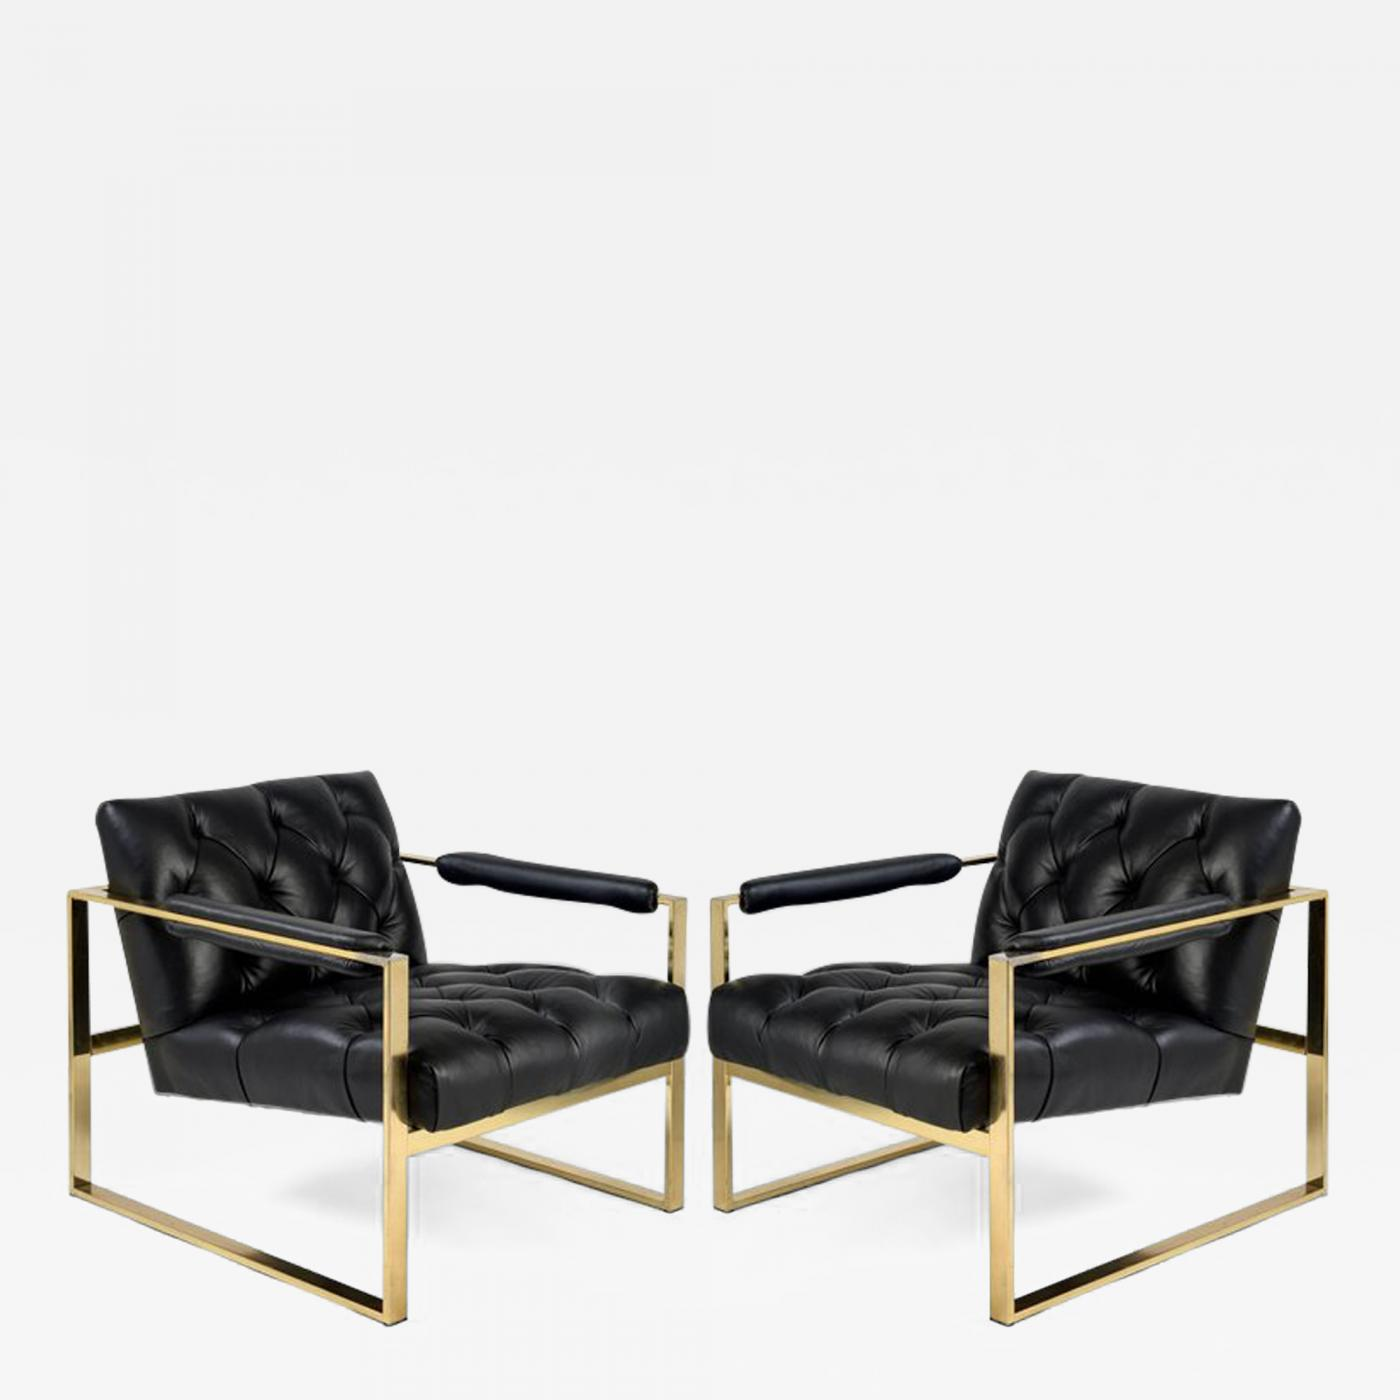 milo baughman furniture. Milo Baughman Pair Of 1970s Flat Bar Chairs Furniture